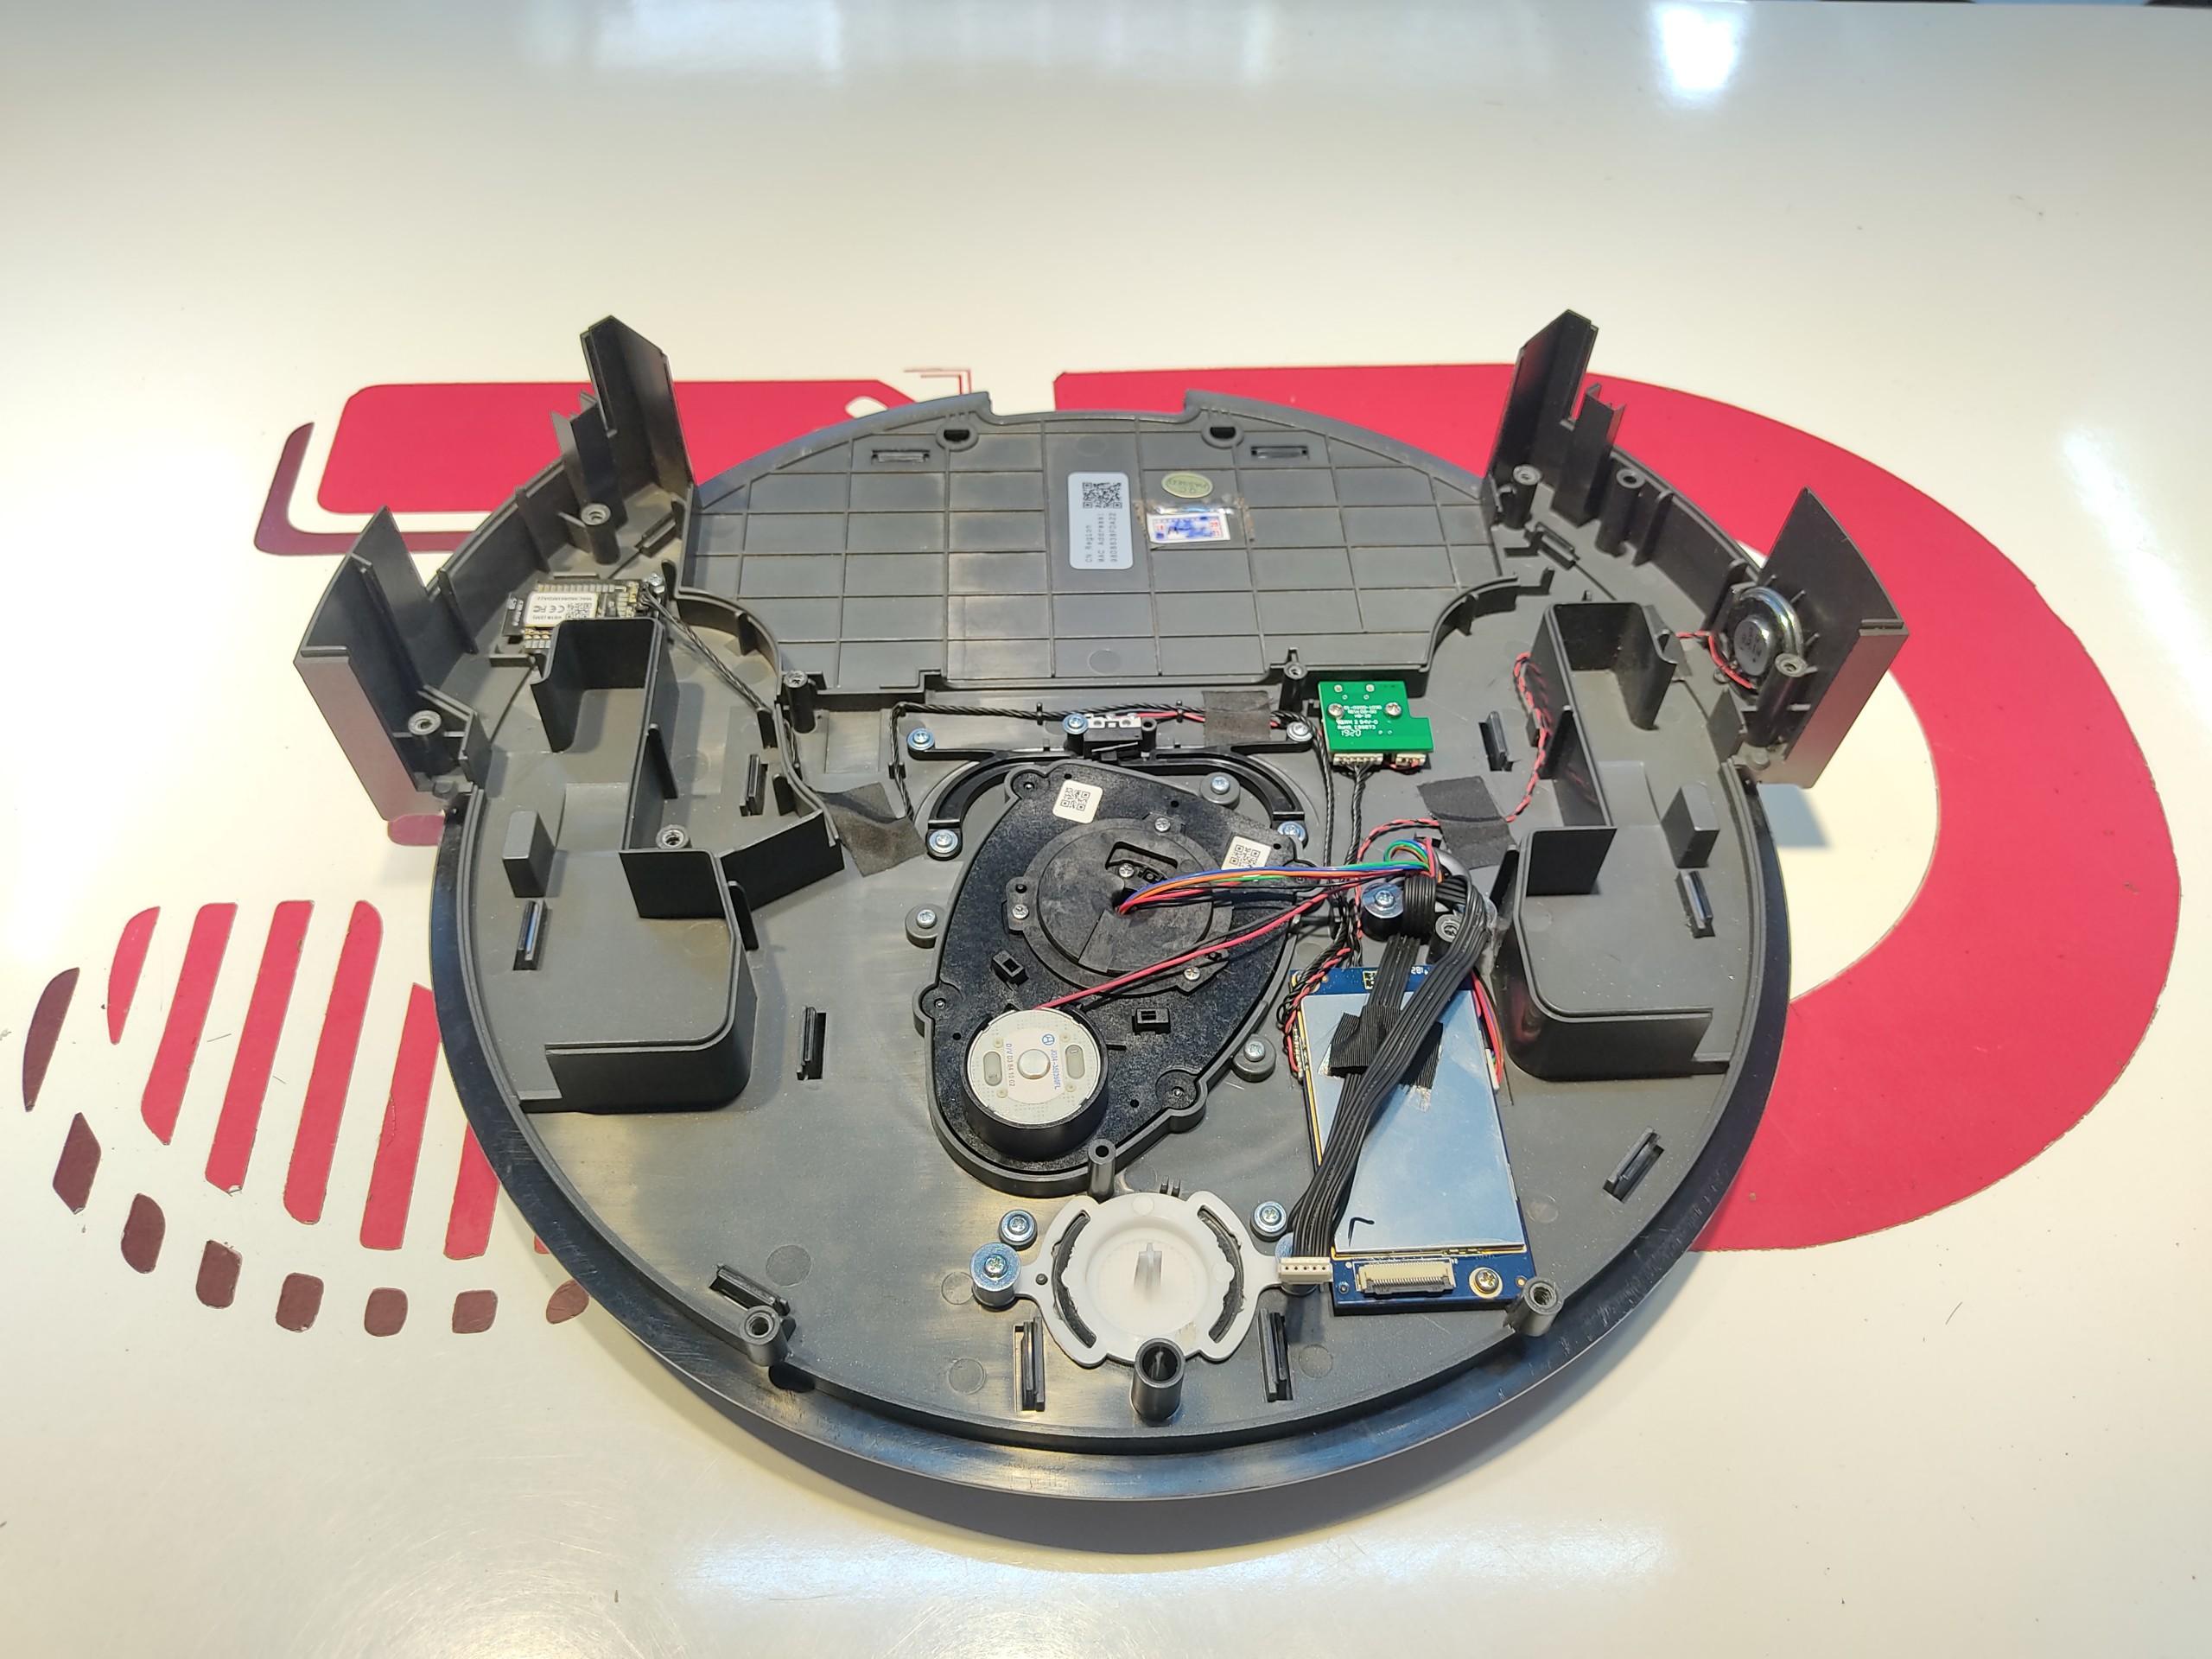 cum-lds-robot-hut-bui-ilife-x900